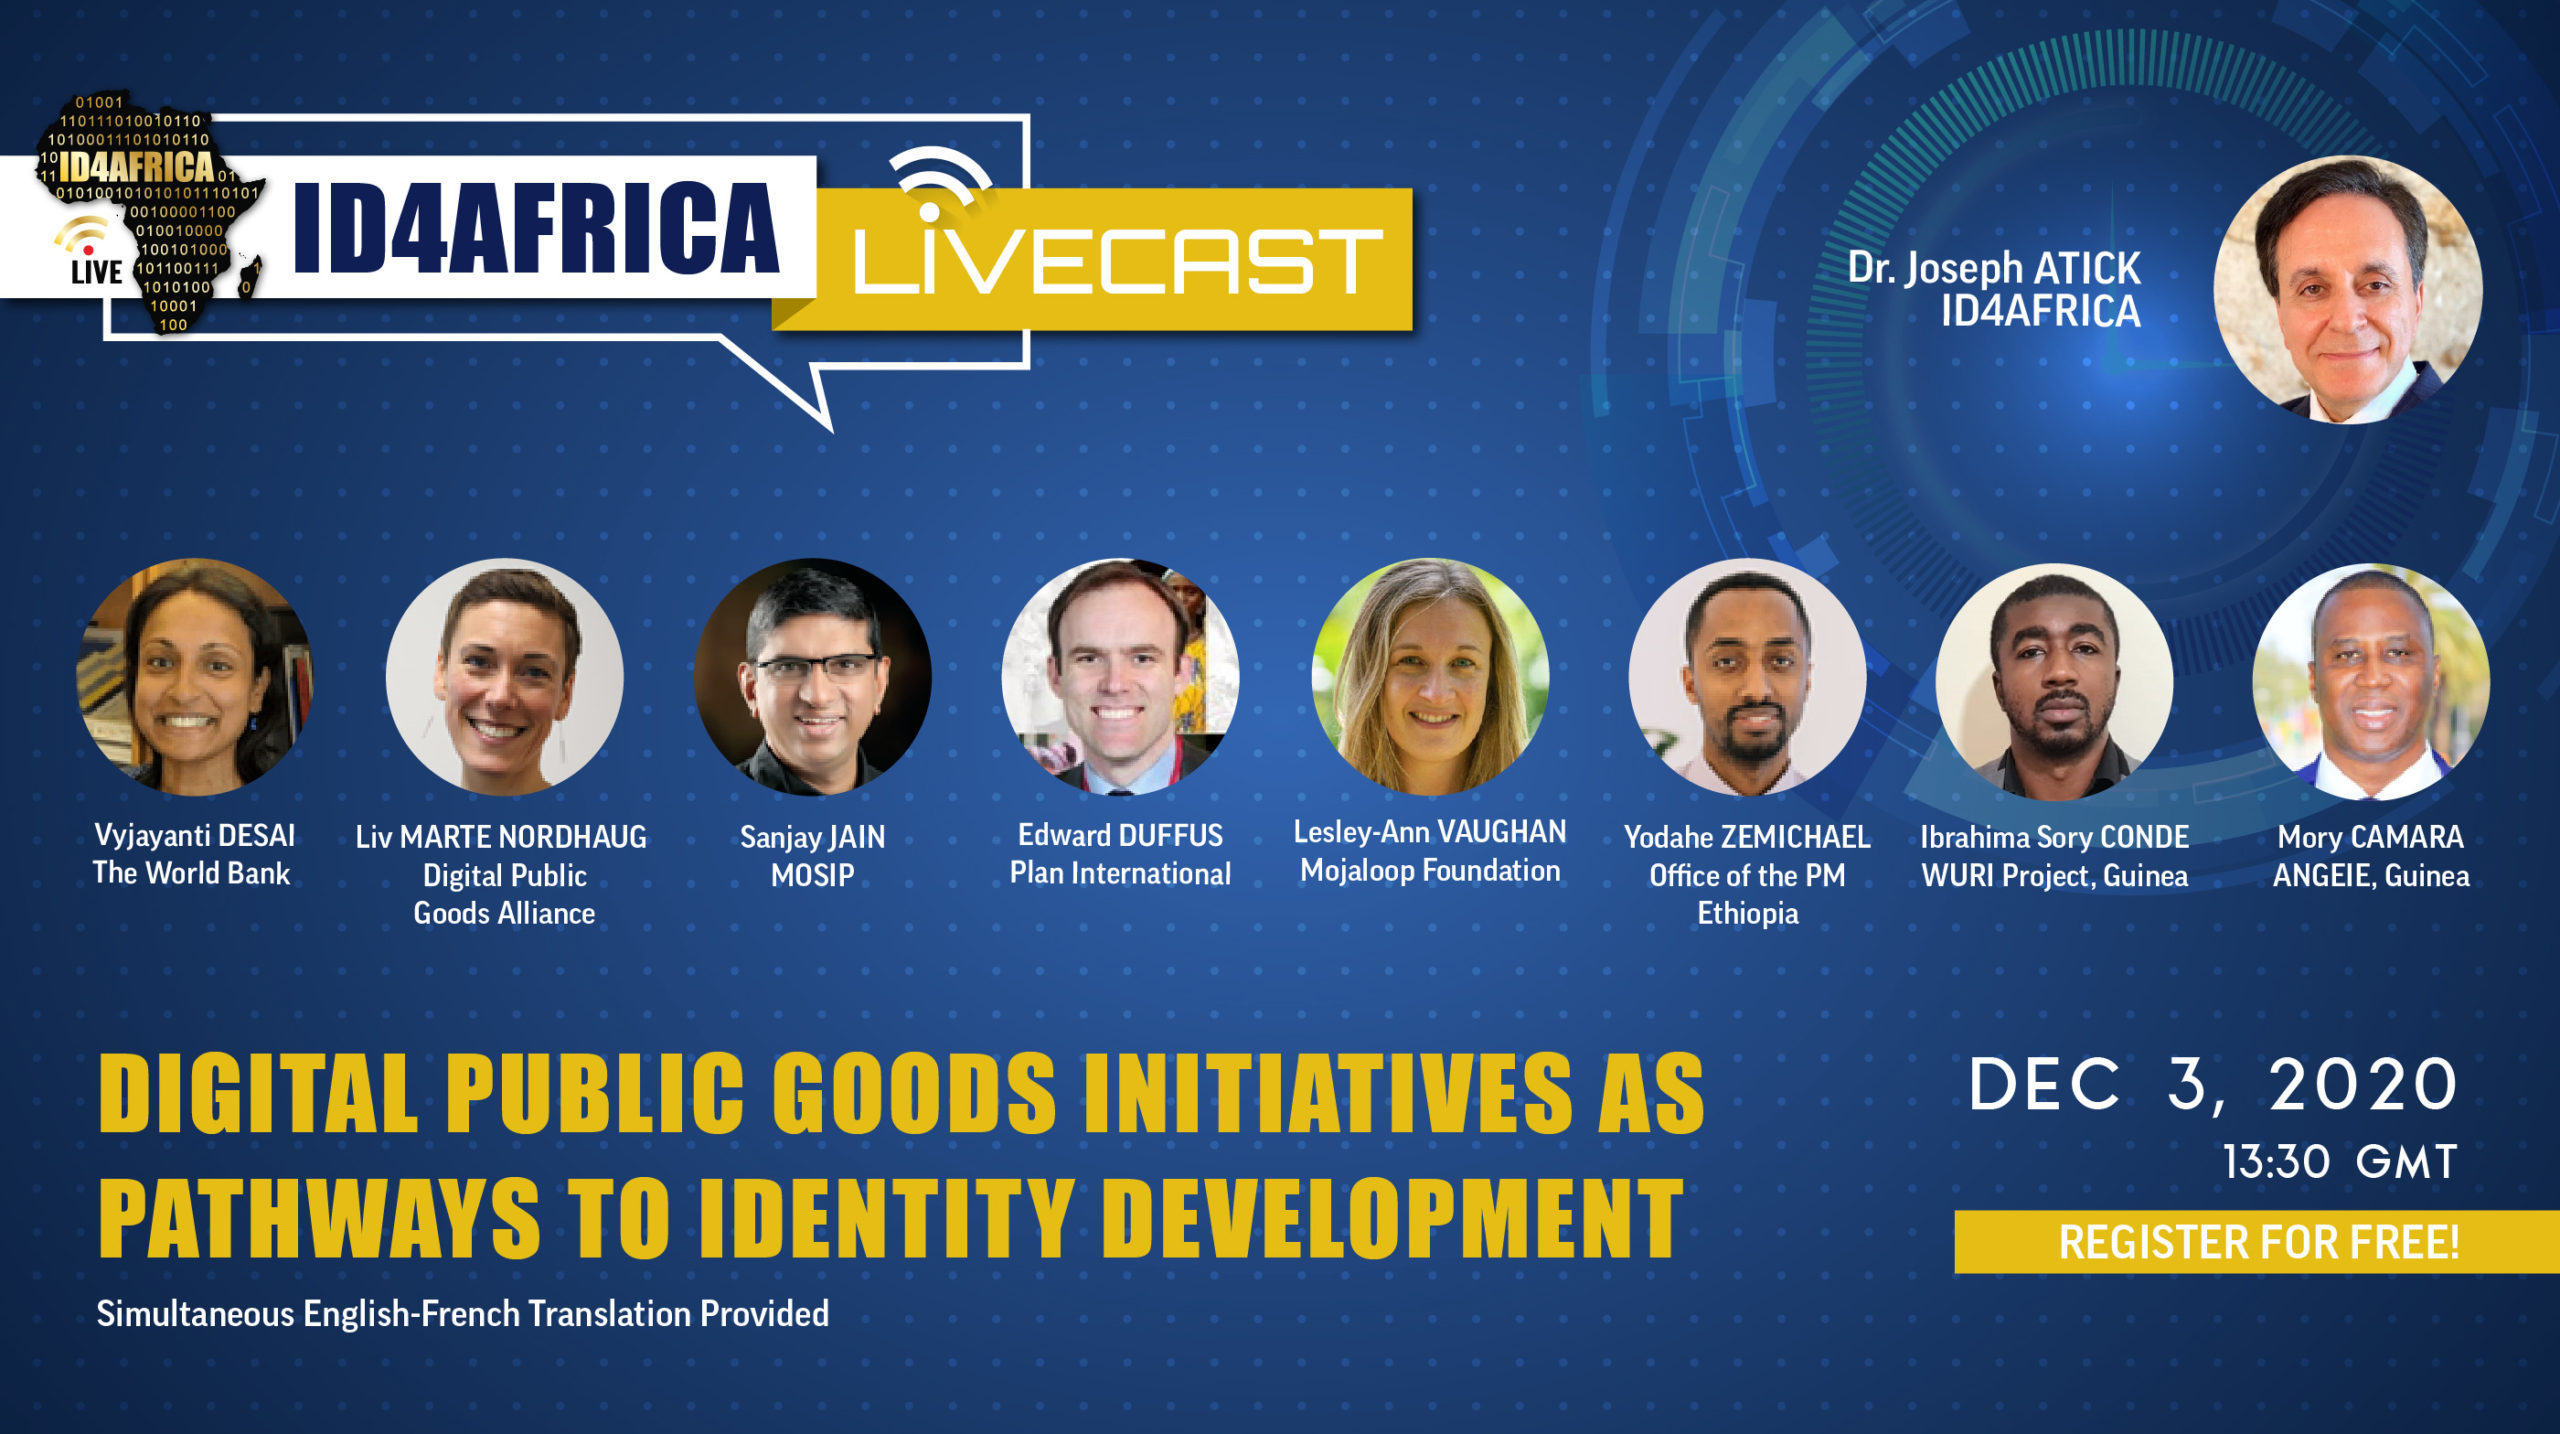 Digital public goods initiatives as pathway to identity development